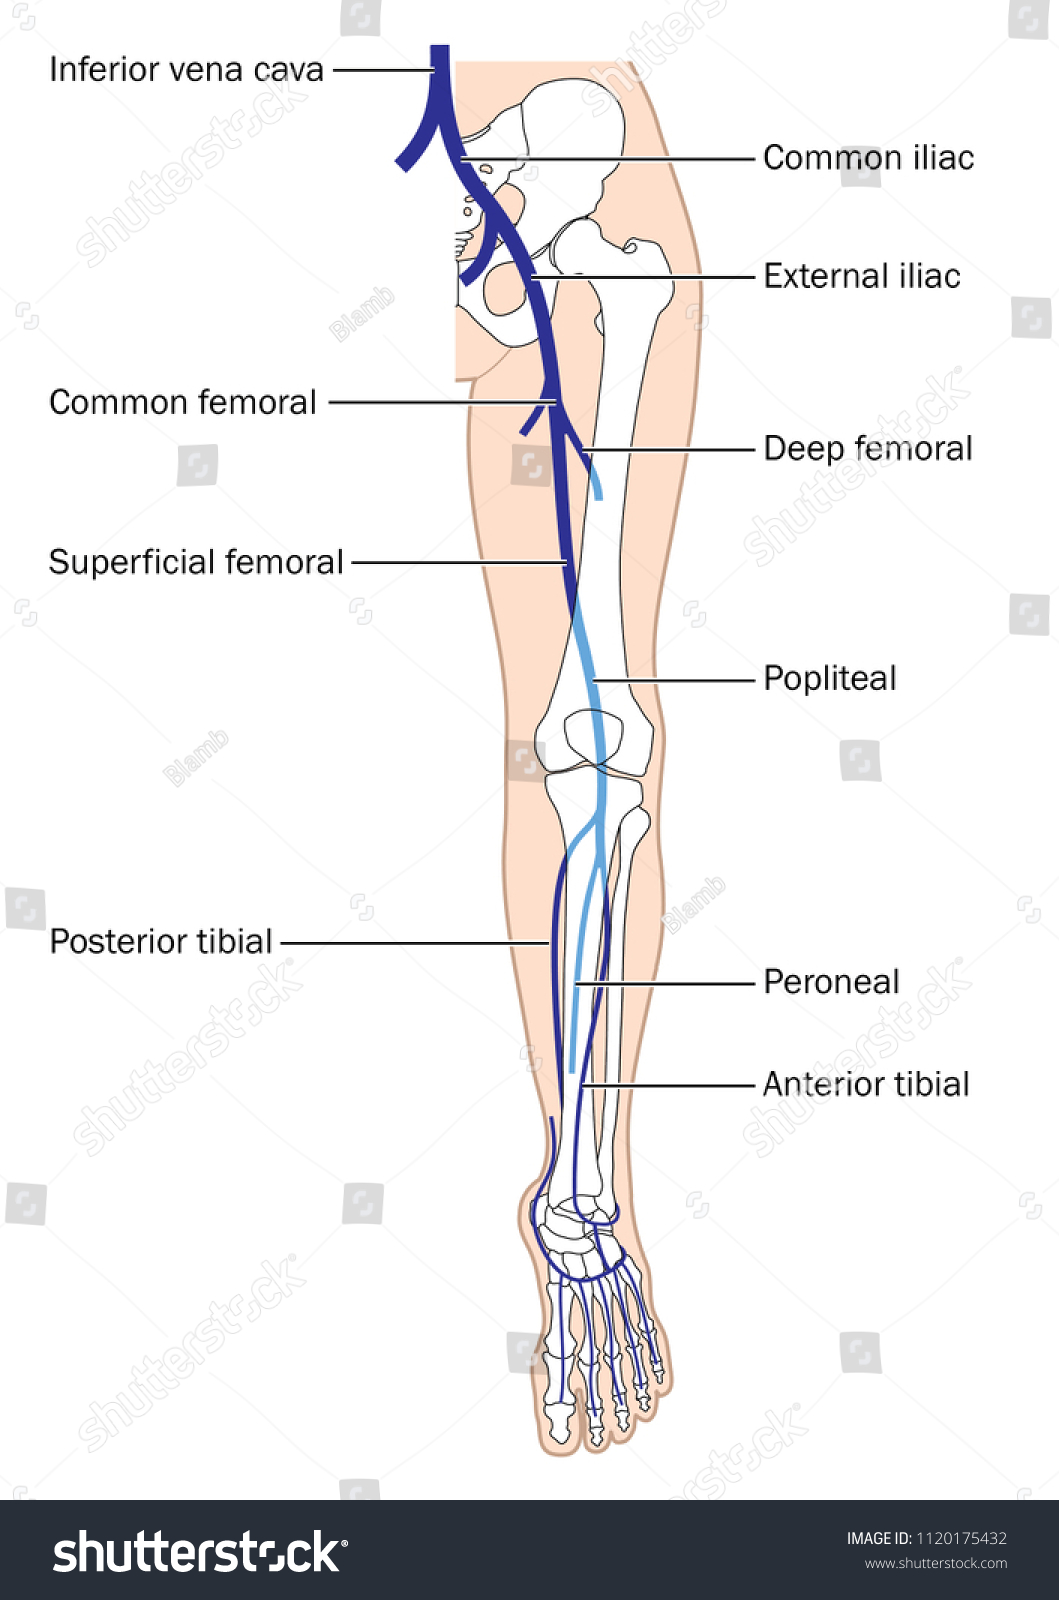 Main Veins Leg Foot Inferior Vena Stock Vector Royalty Free